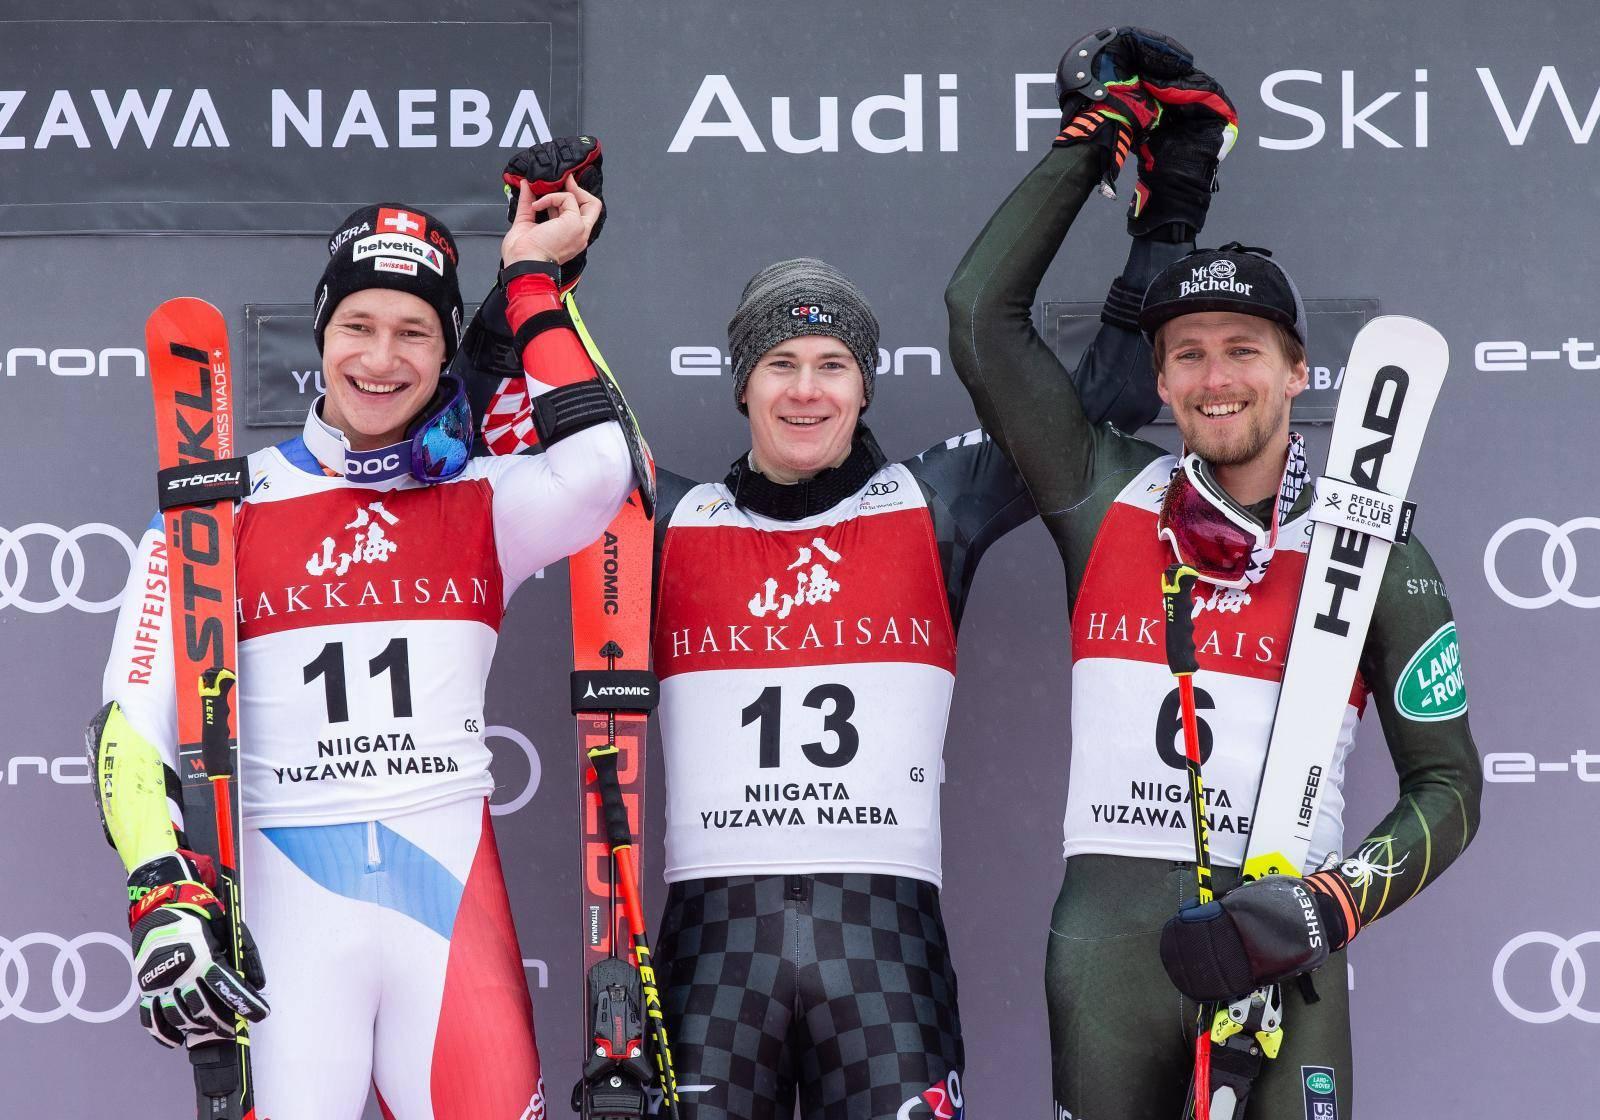 ALPINE SKIING - FIS WC Yuzawa Naeba